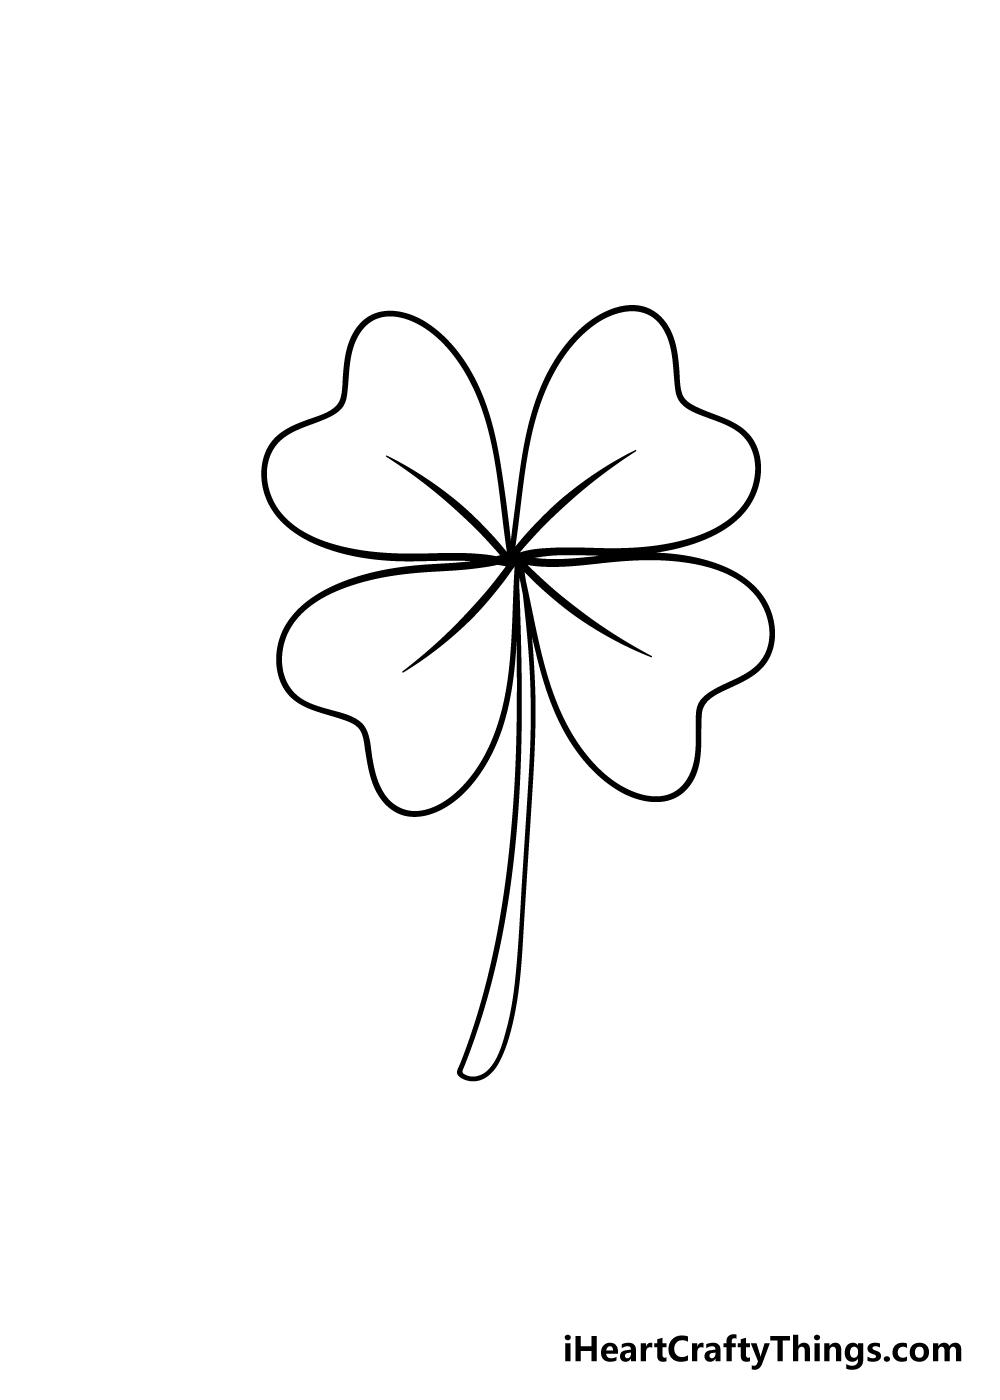 drawing four-leaf clover step 6